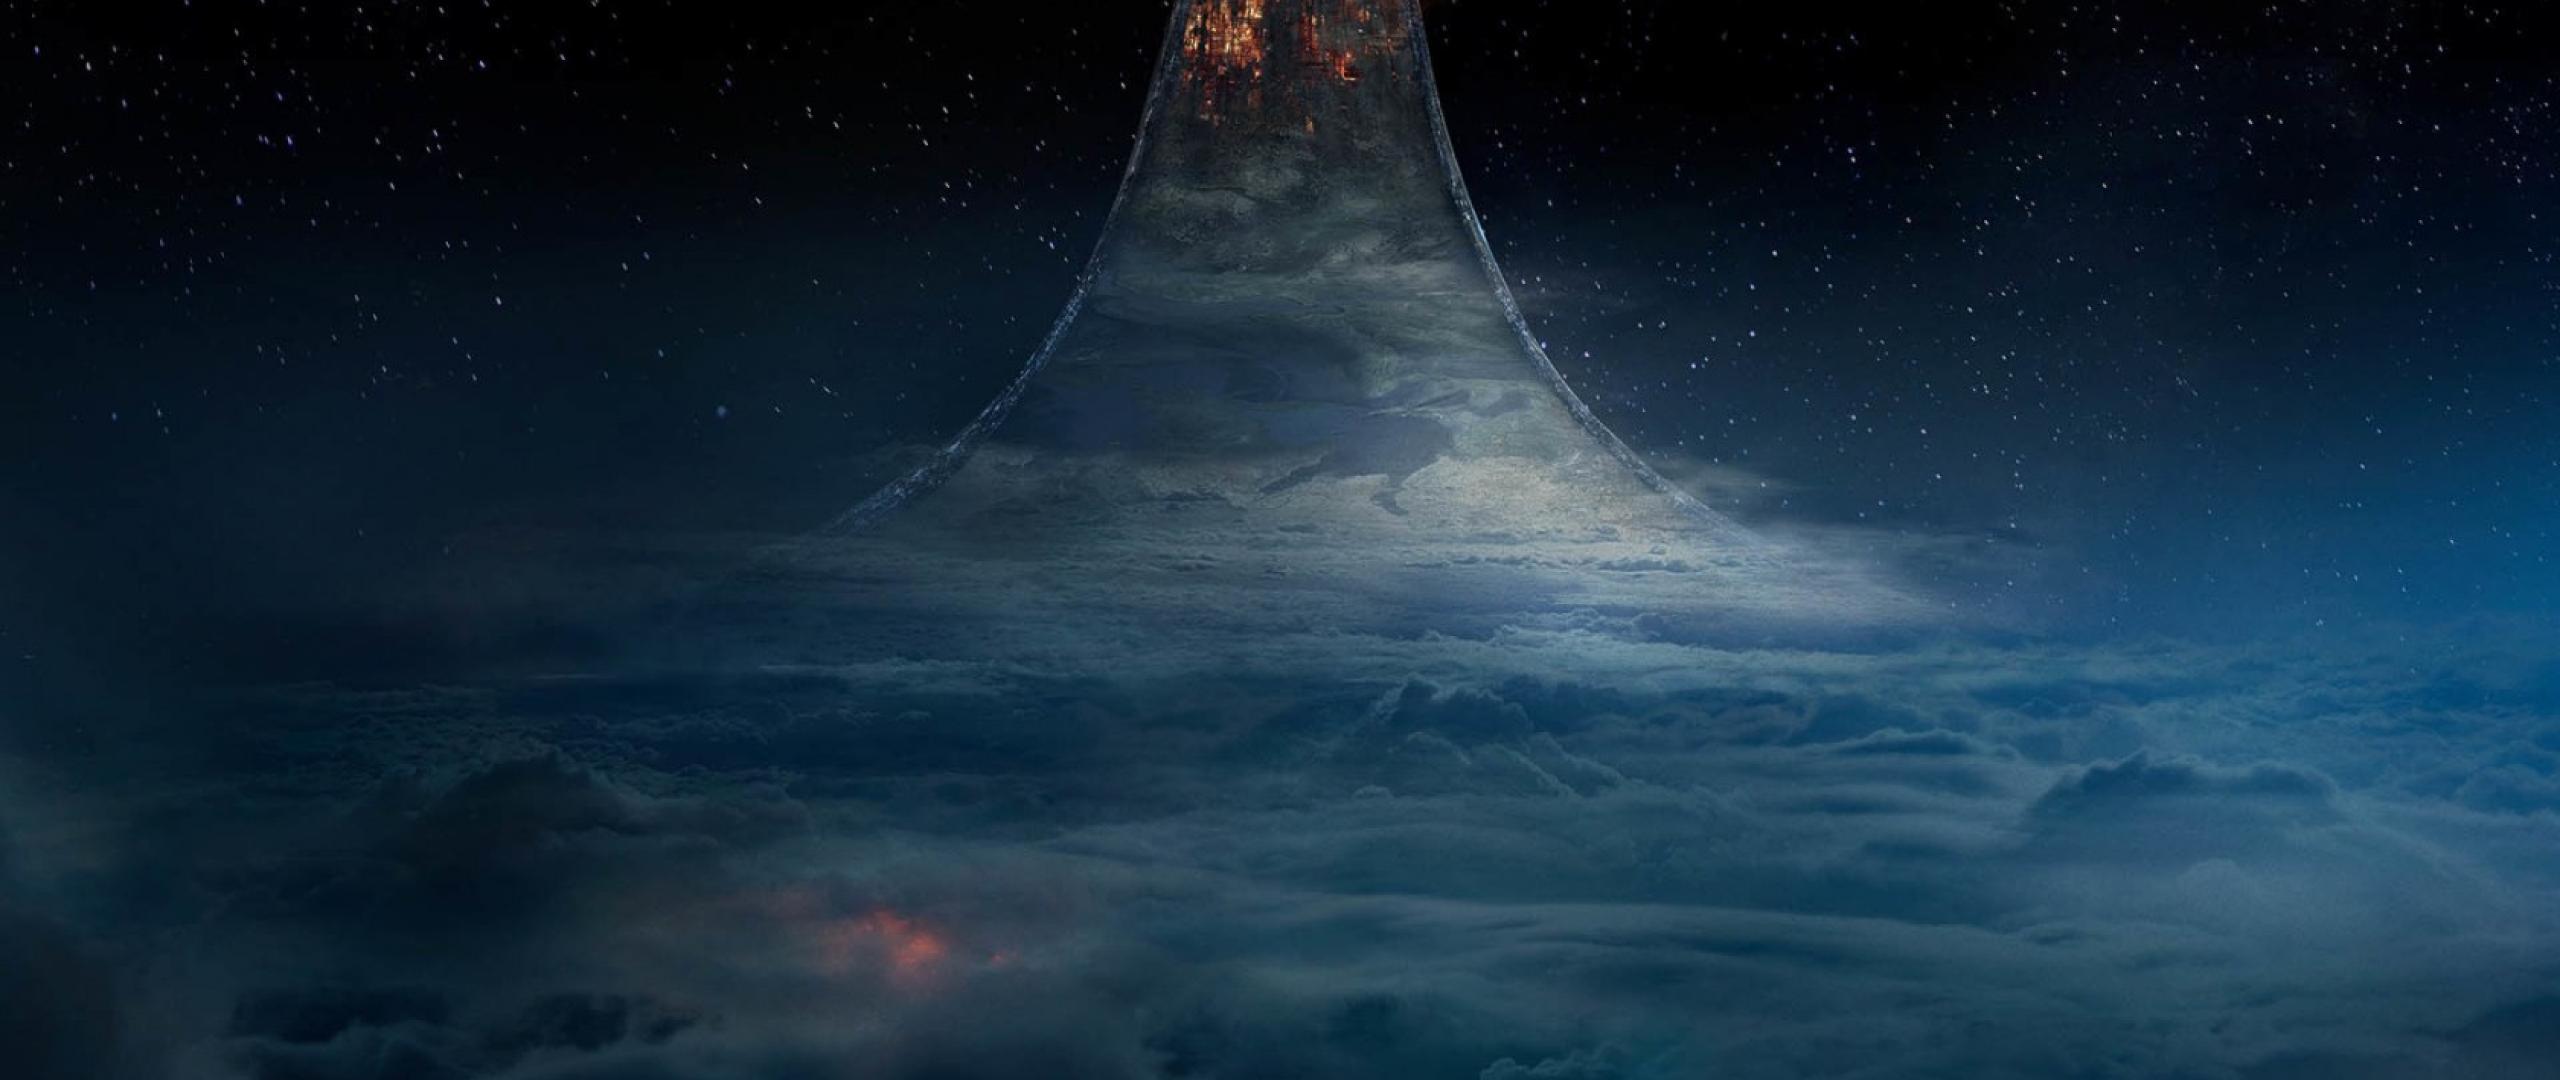 Halo Nightfall Ring Planet Full Hd Wallpaper